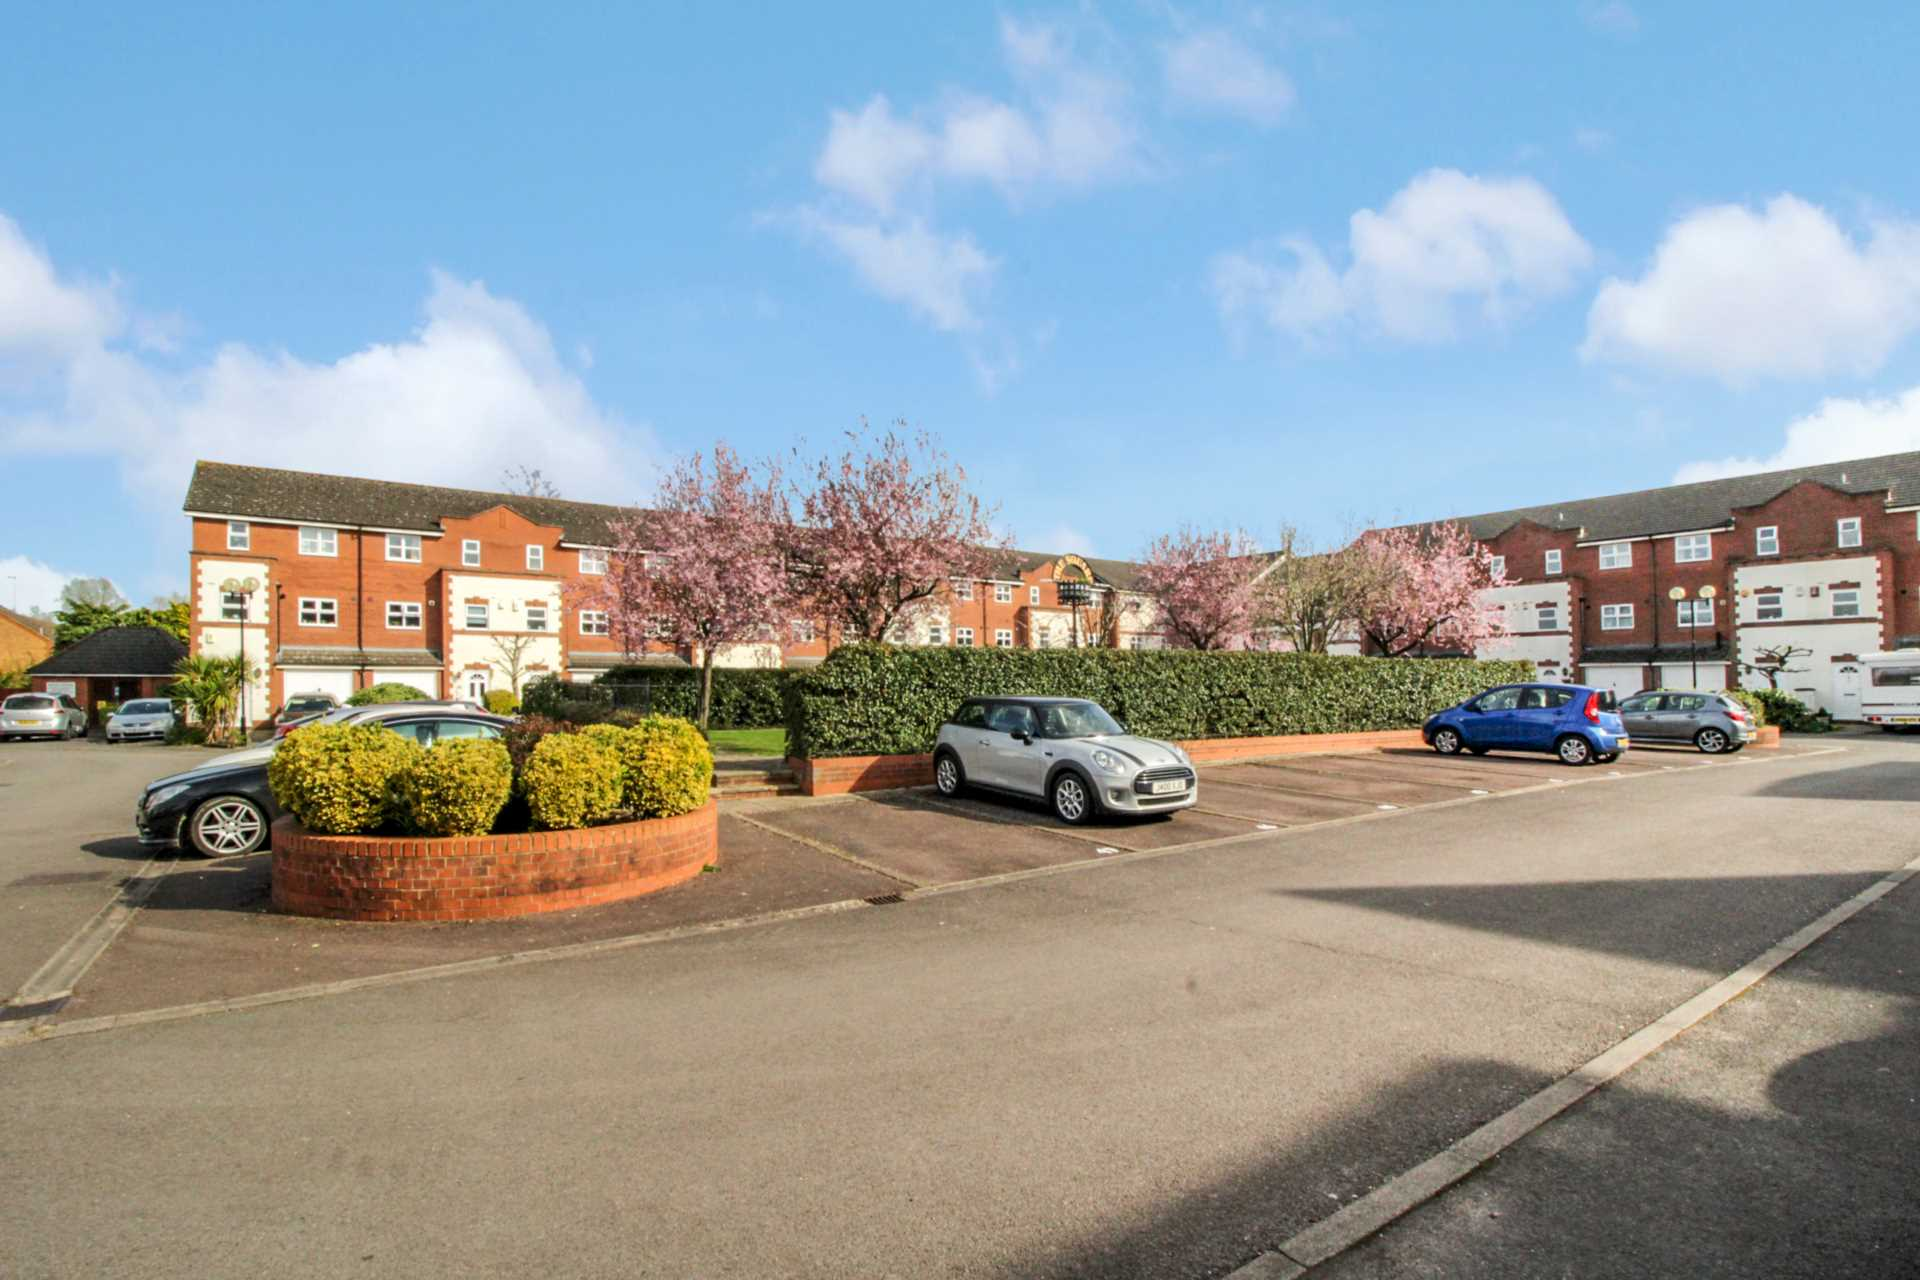 Coopers Gate, Banbury, Image 2